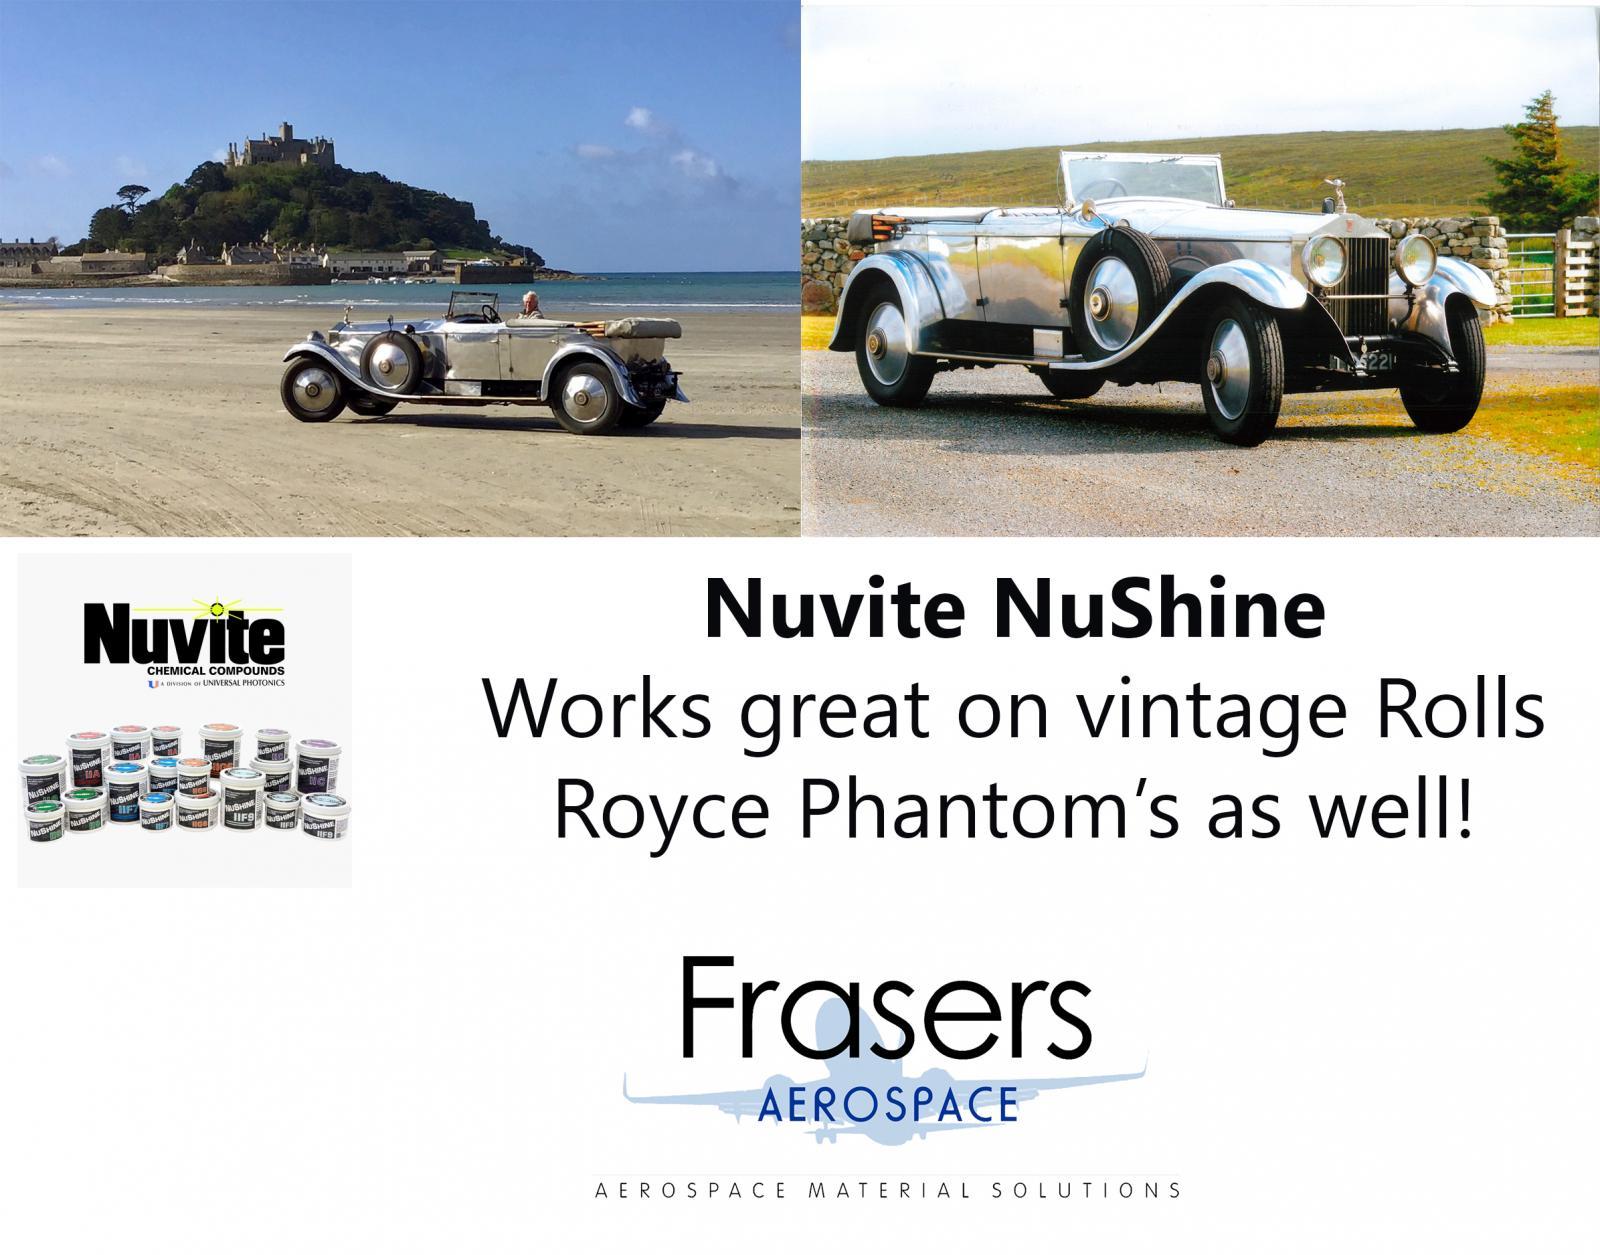 Nushine Rolls Royce